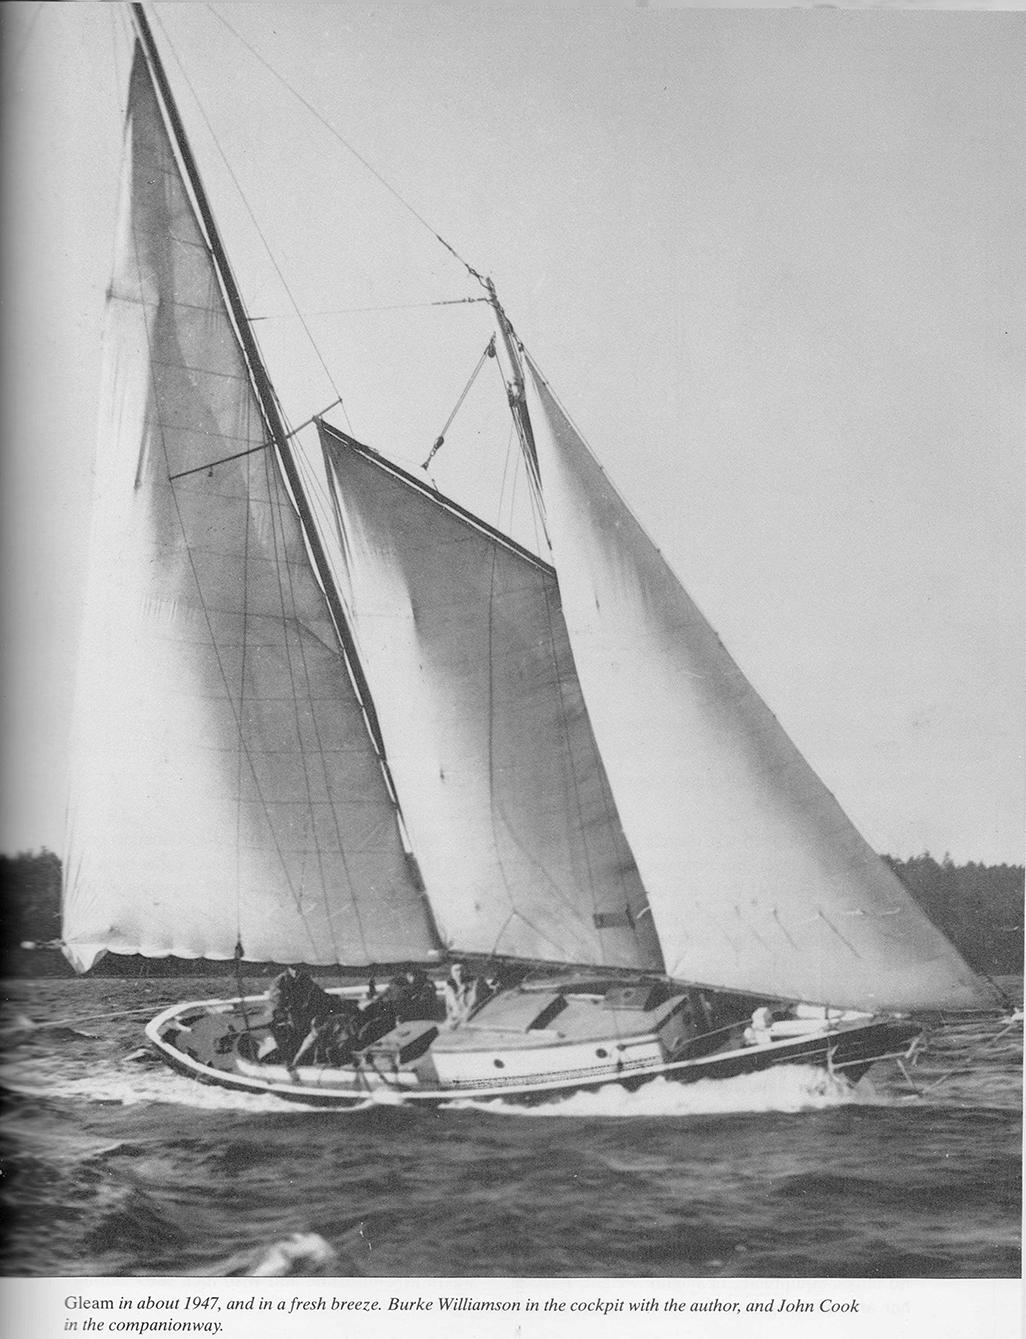 A celebration of small schooners for 68 garden design gaff rigged schooner